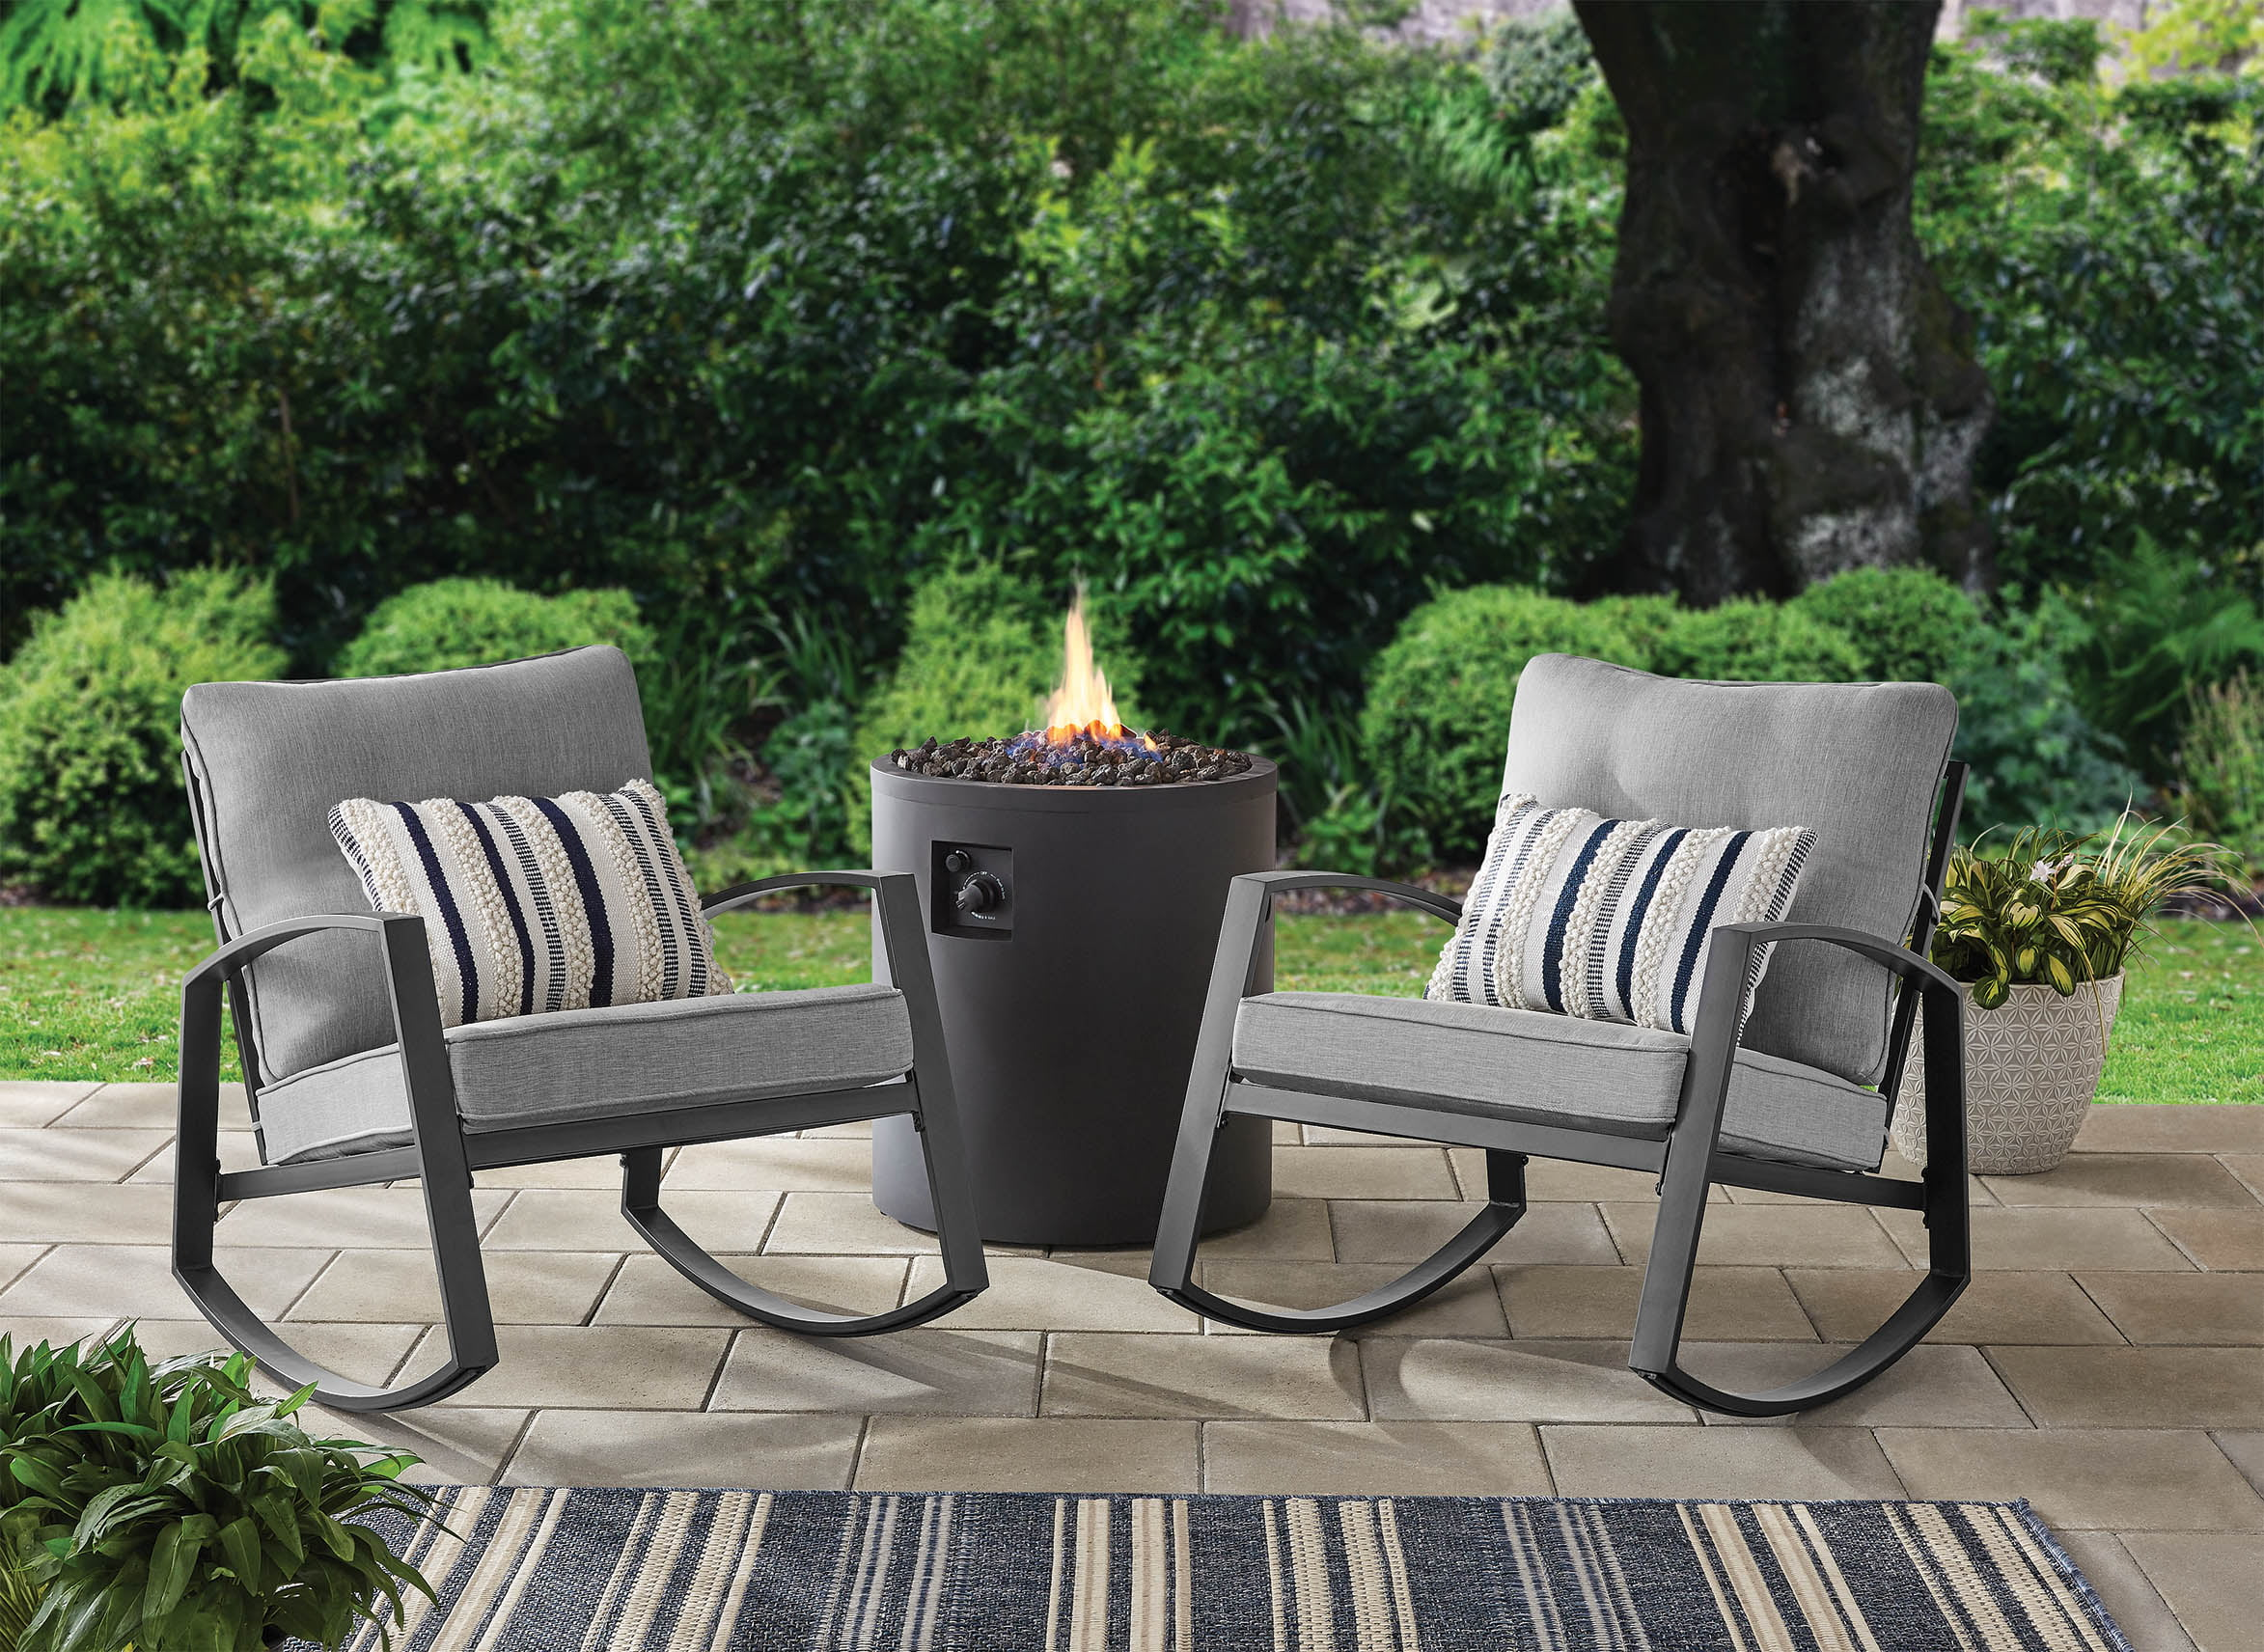 mainstays asher springs 2 piece steel cushioned rocking chair set grey walmart com